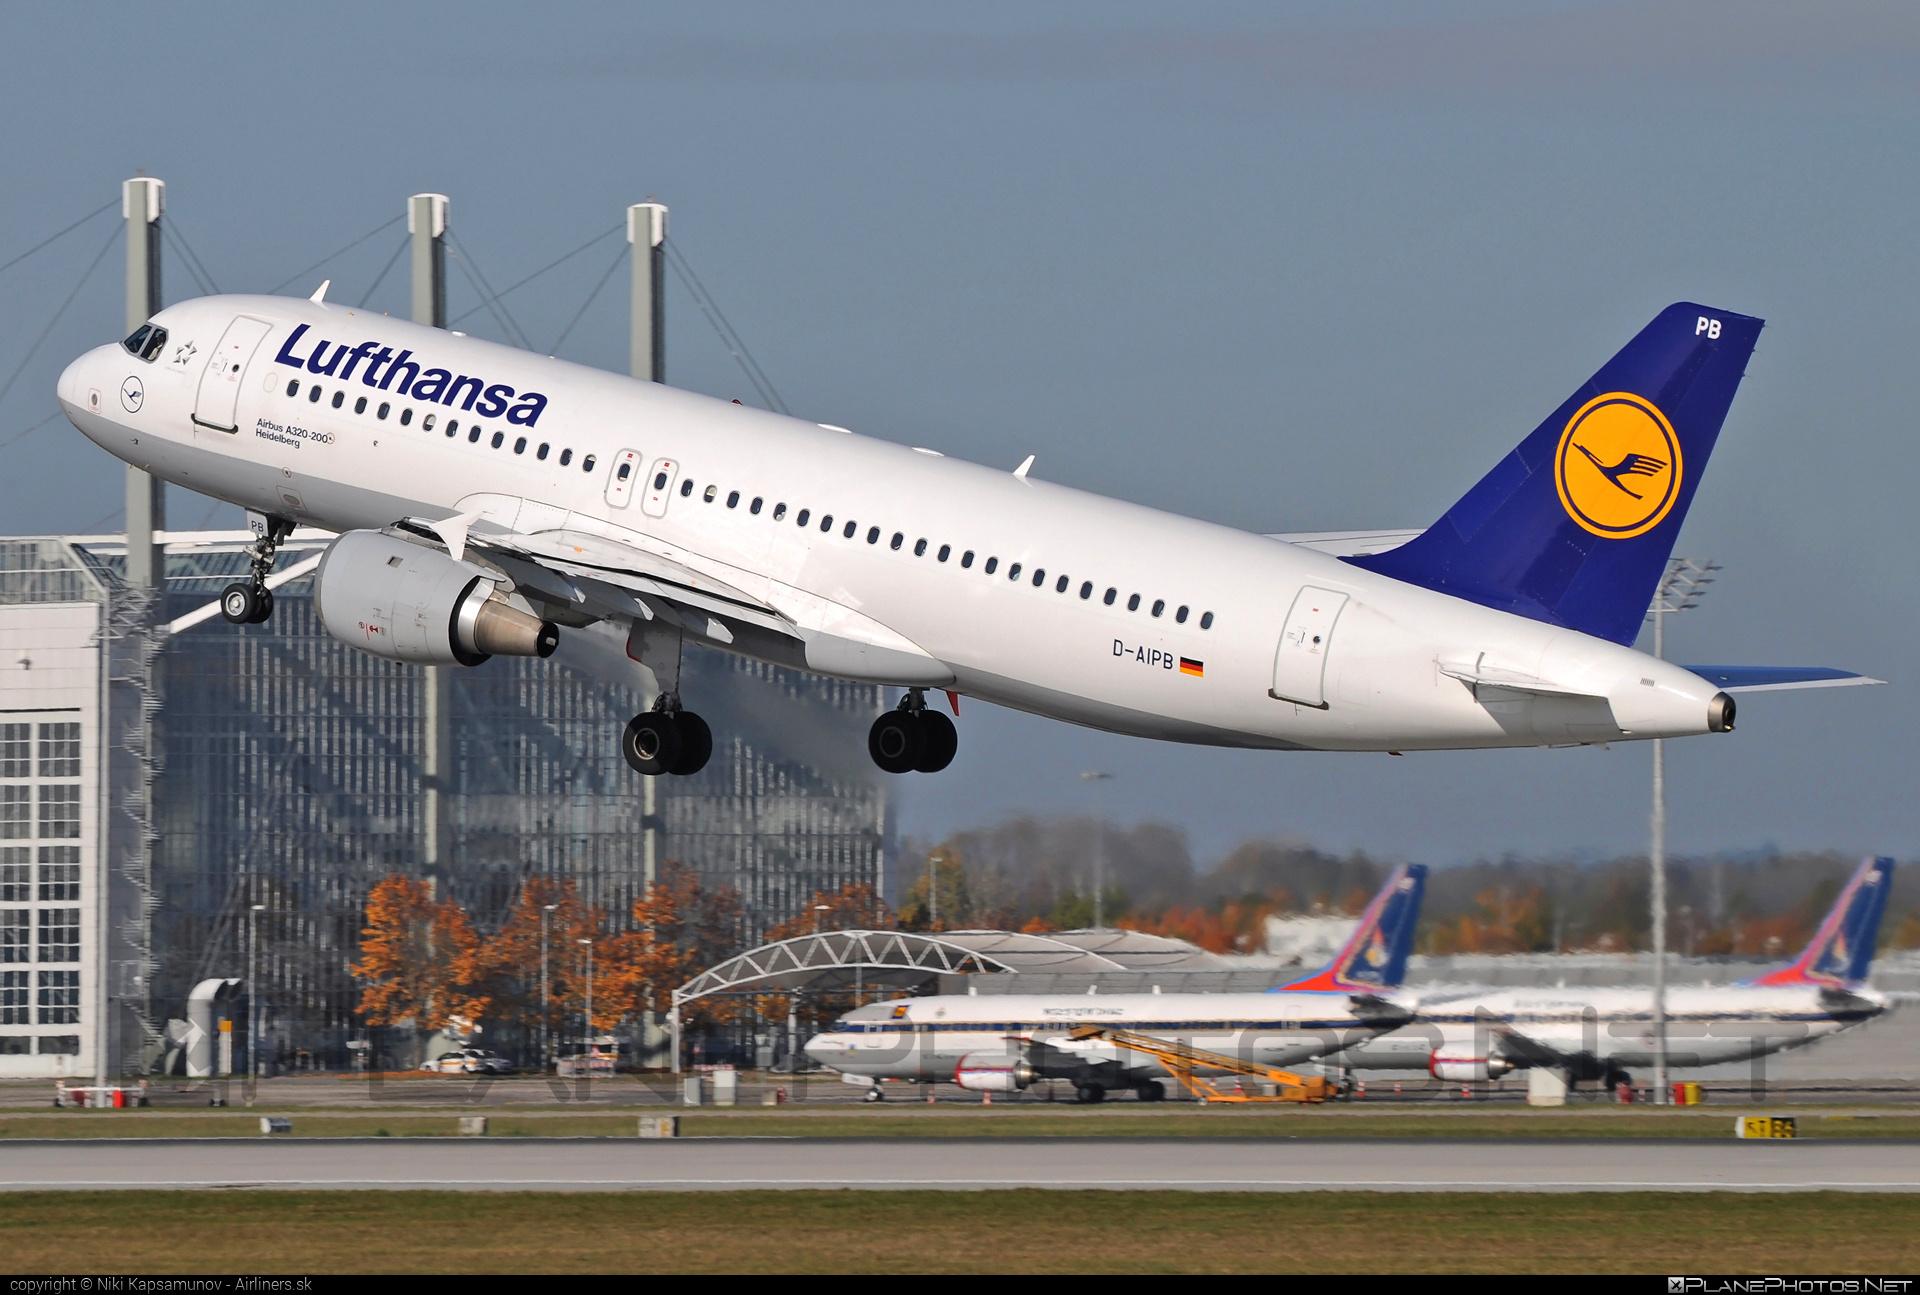 Airbus A320-211 - D-AIPB operated by Lufthansa #a320 #a320family #airbus #airbus320 #lufthansa